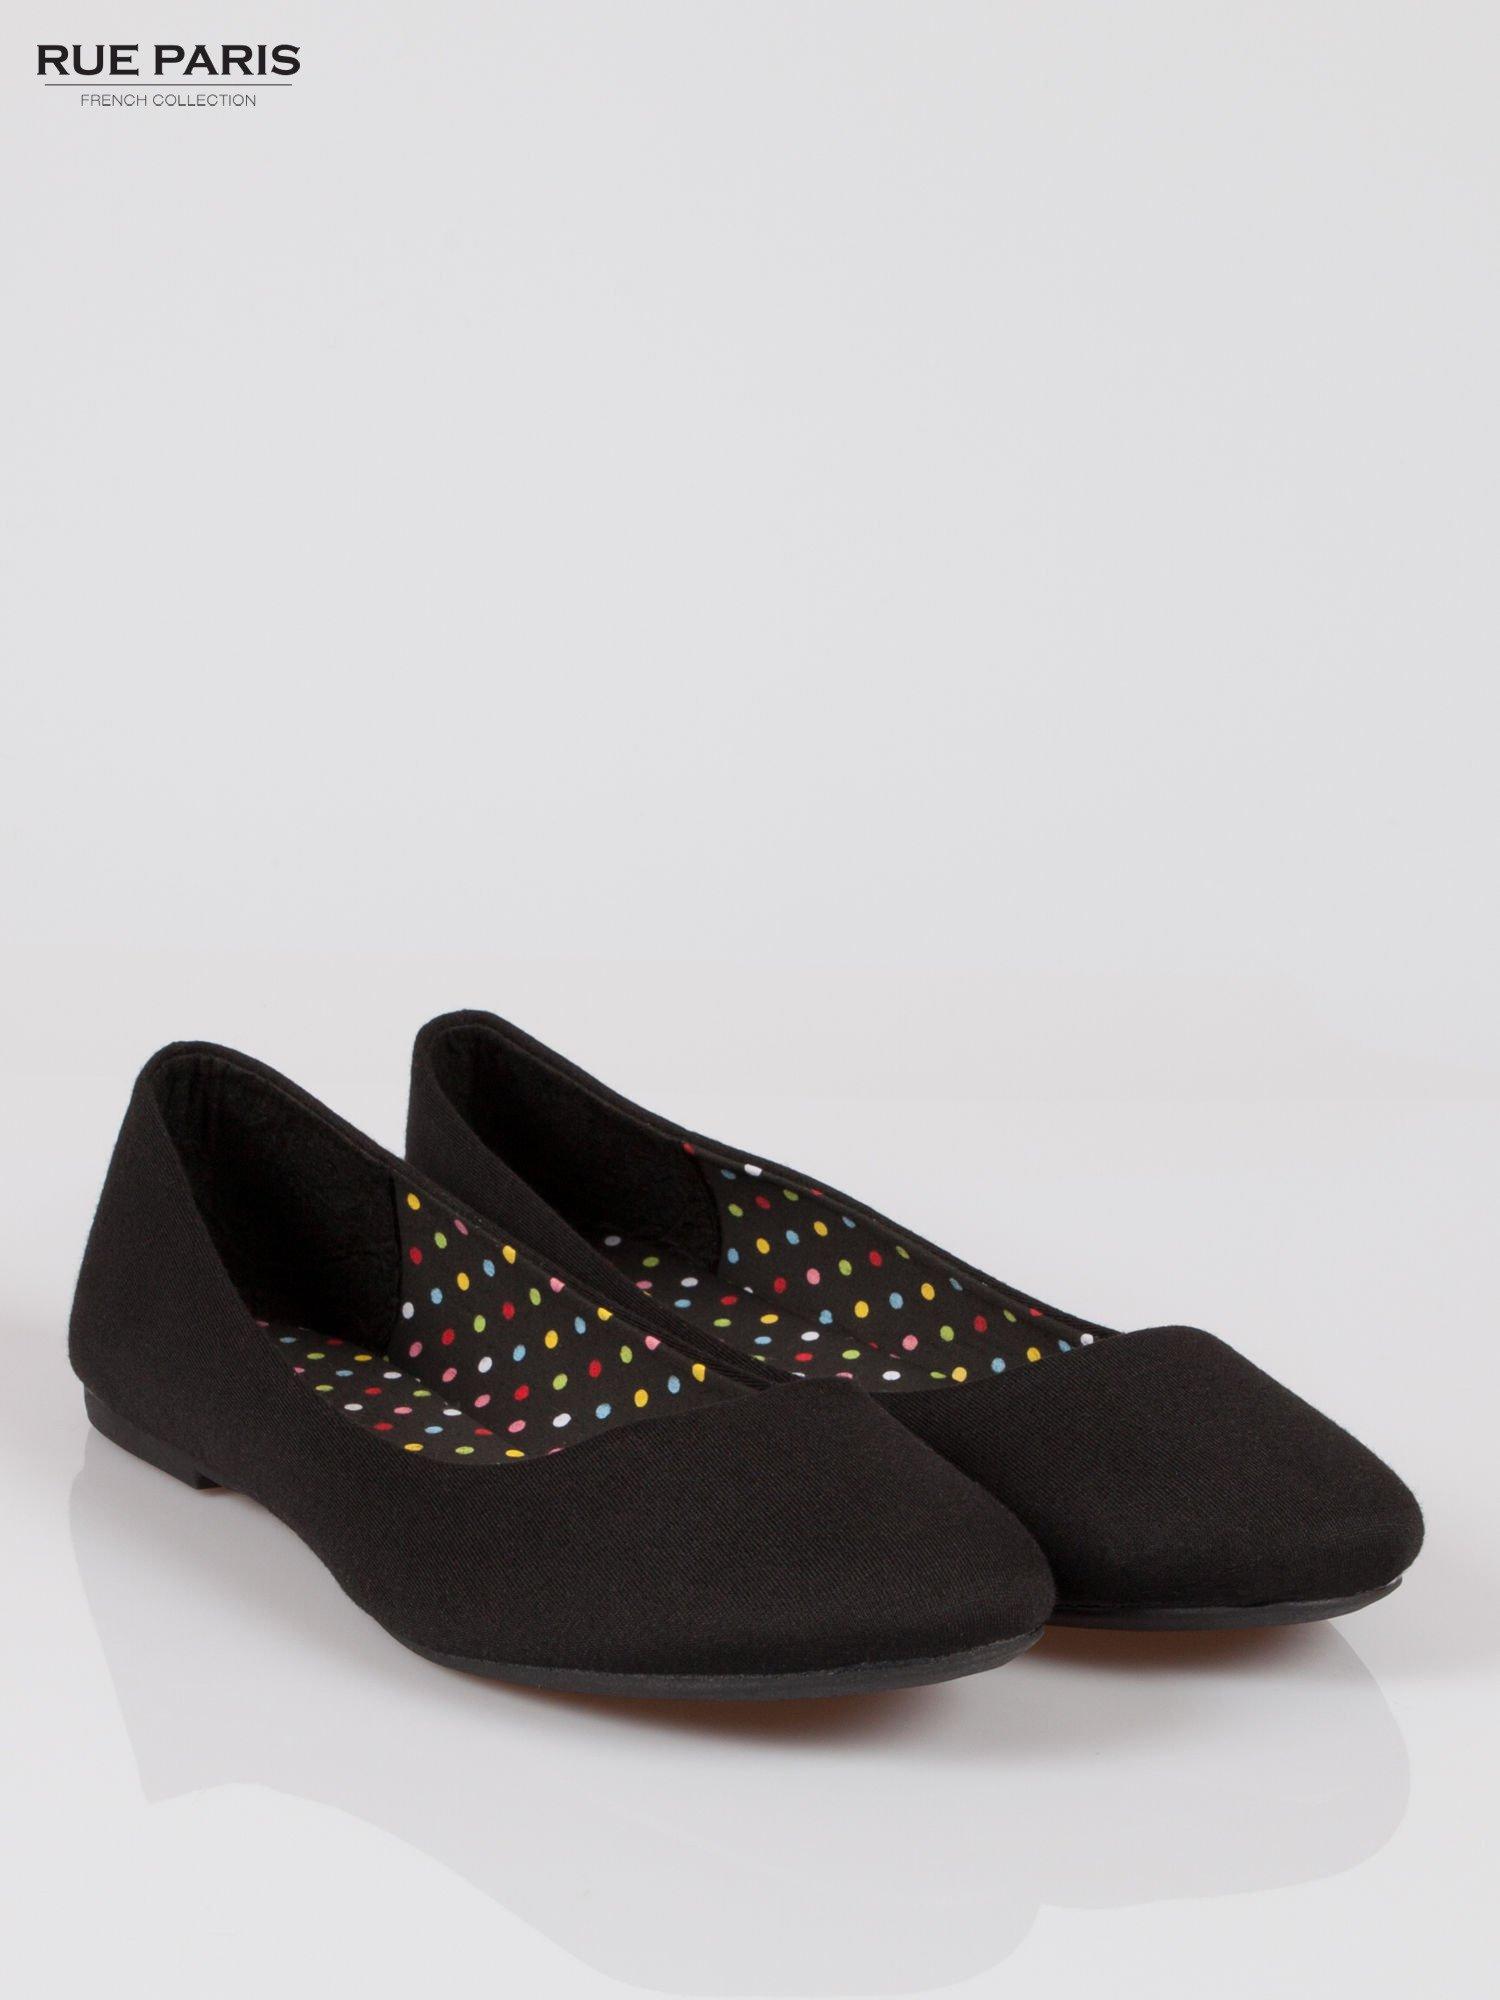 Czarne lekkie baleriny z tkaniny                                  zdj.                                  2